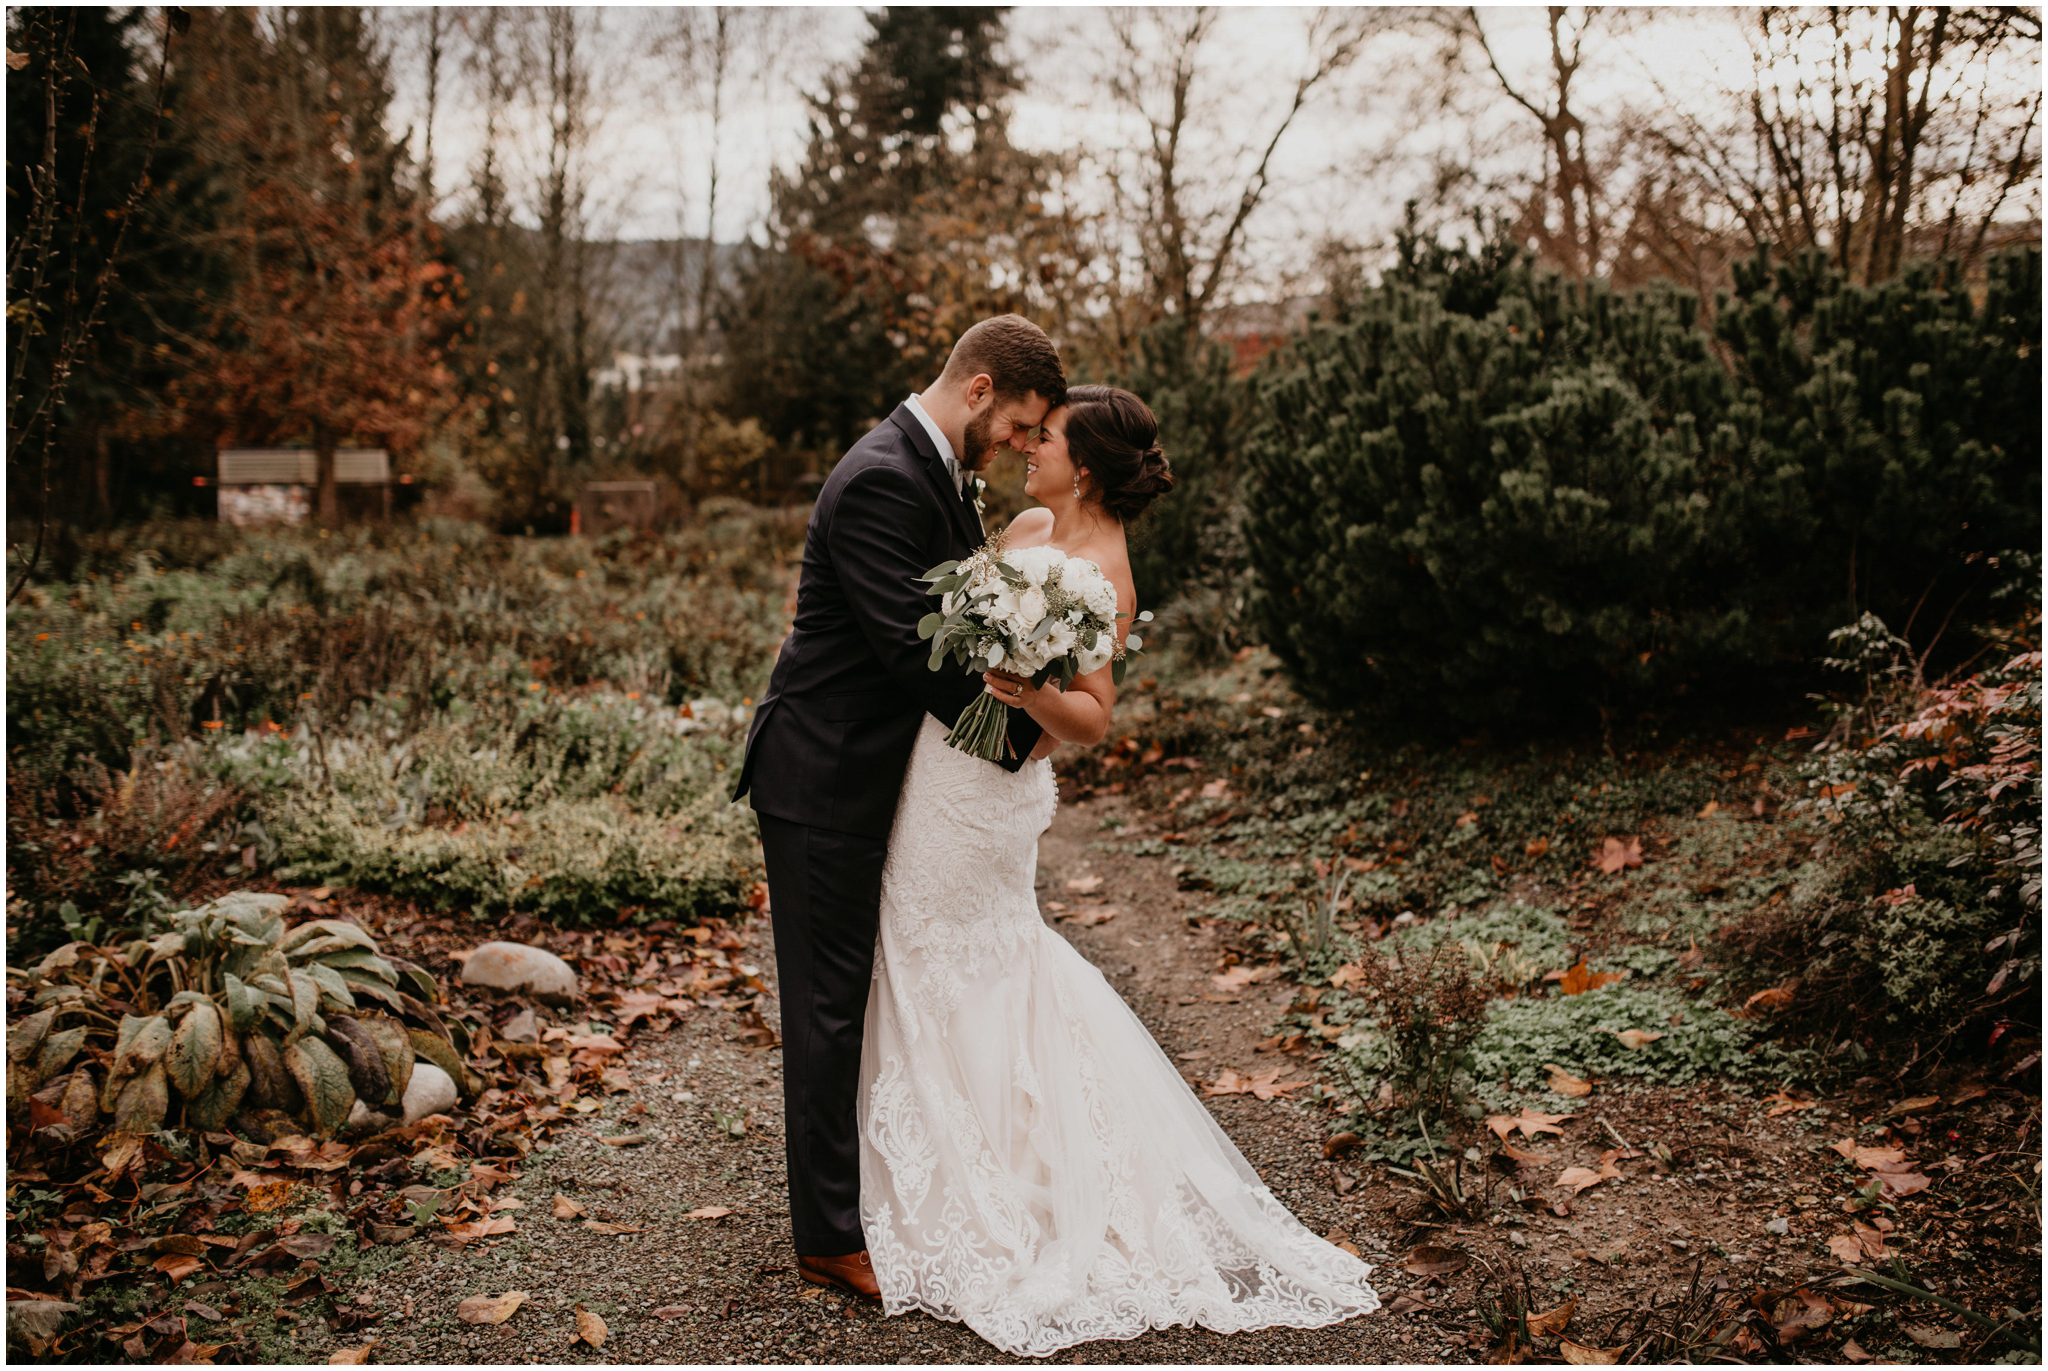 ashley-tj-the-pickering-barn-winter-wedding-seattle-photographer-043.jpg